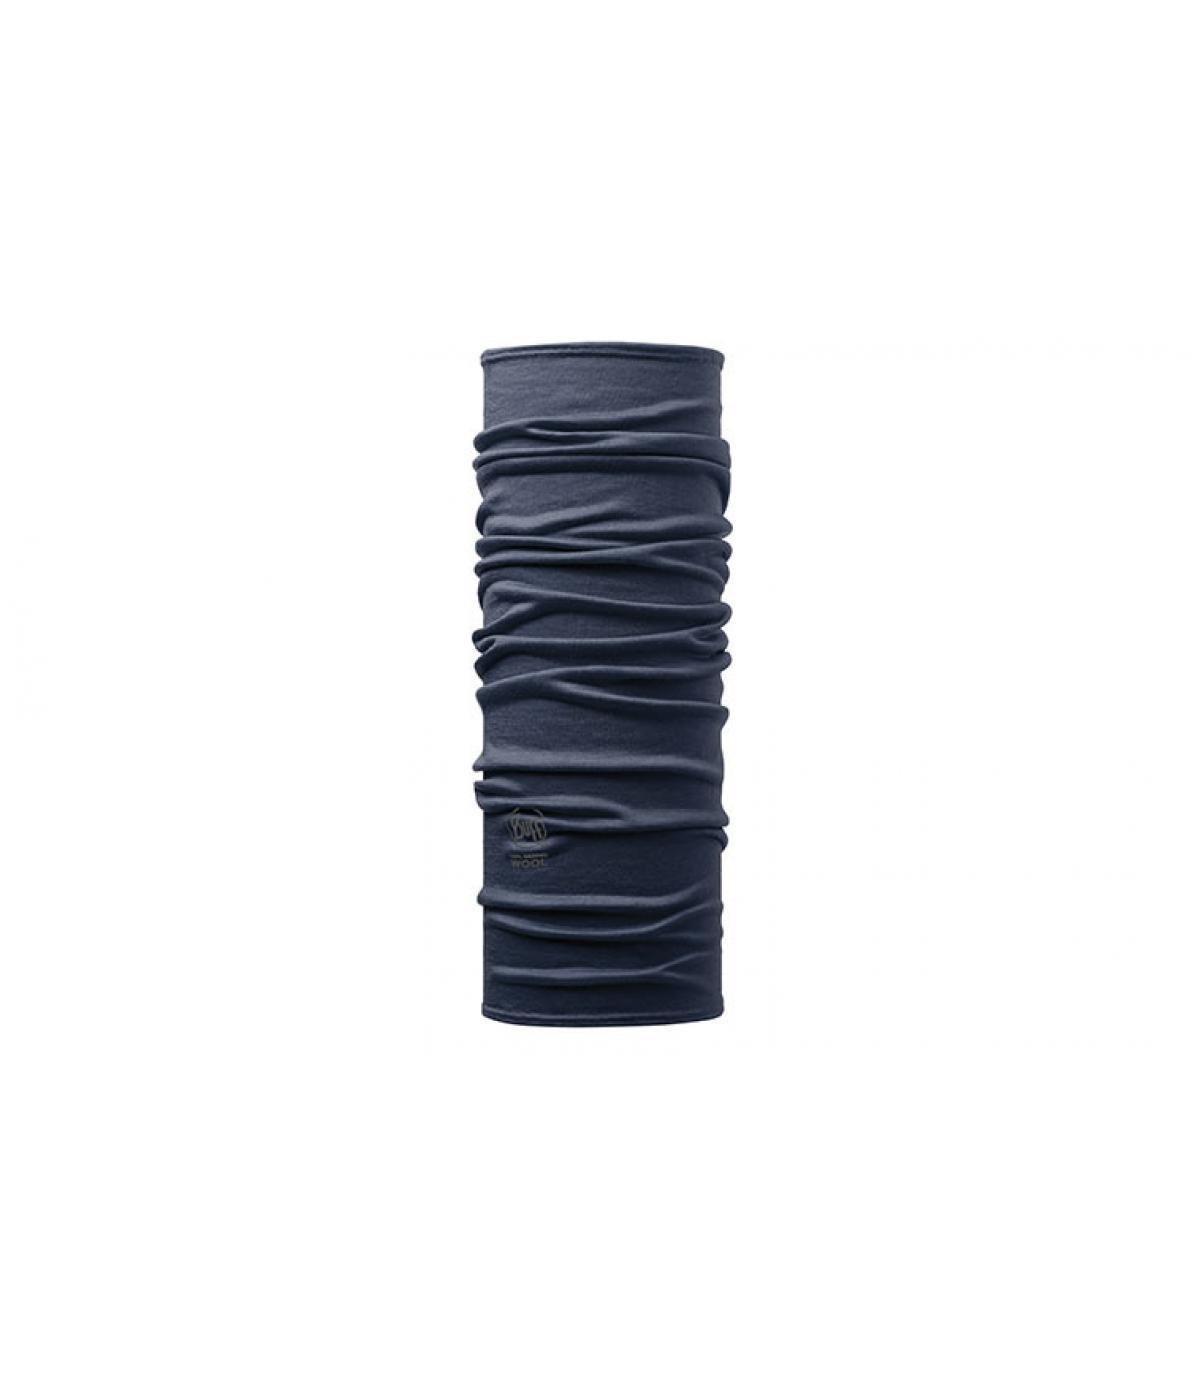 Buff neckwear merino wool